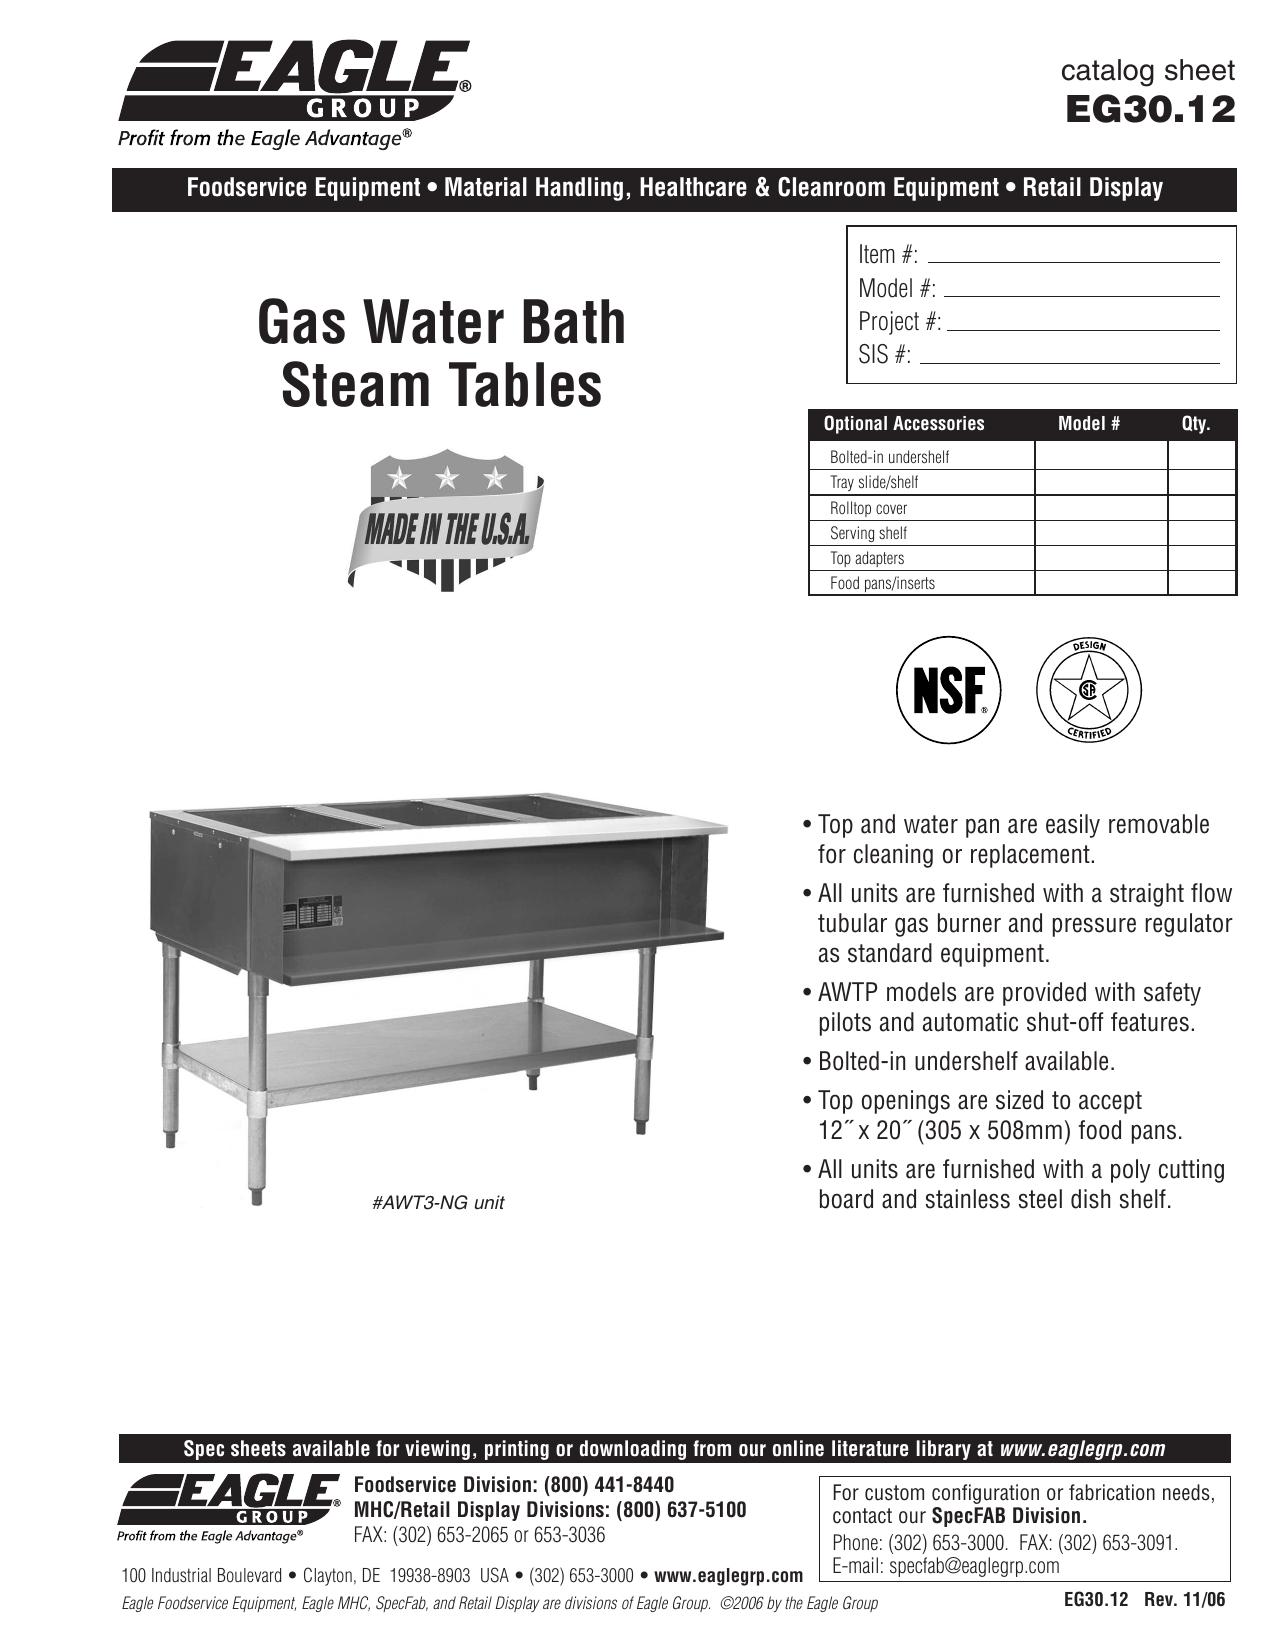 Gas Water Bath Steam Tables - Eagle group steam table